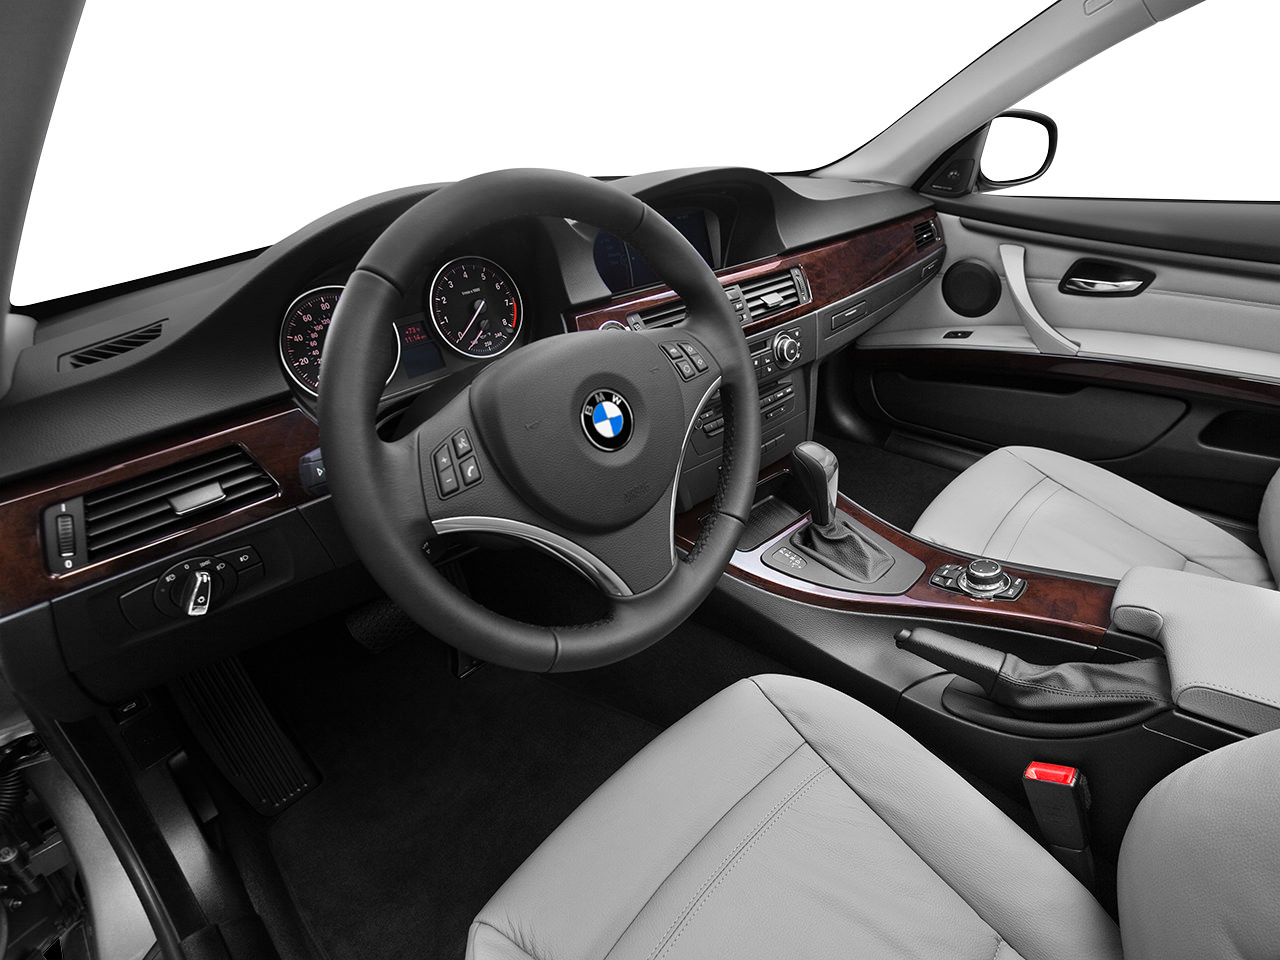 bmw 335 d 2012 interior